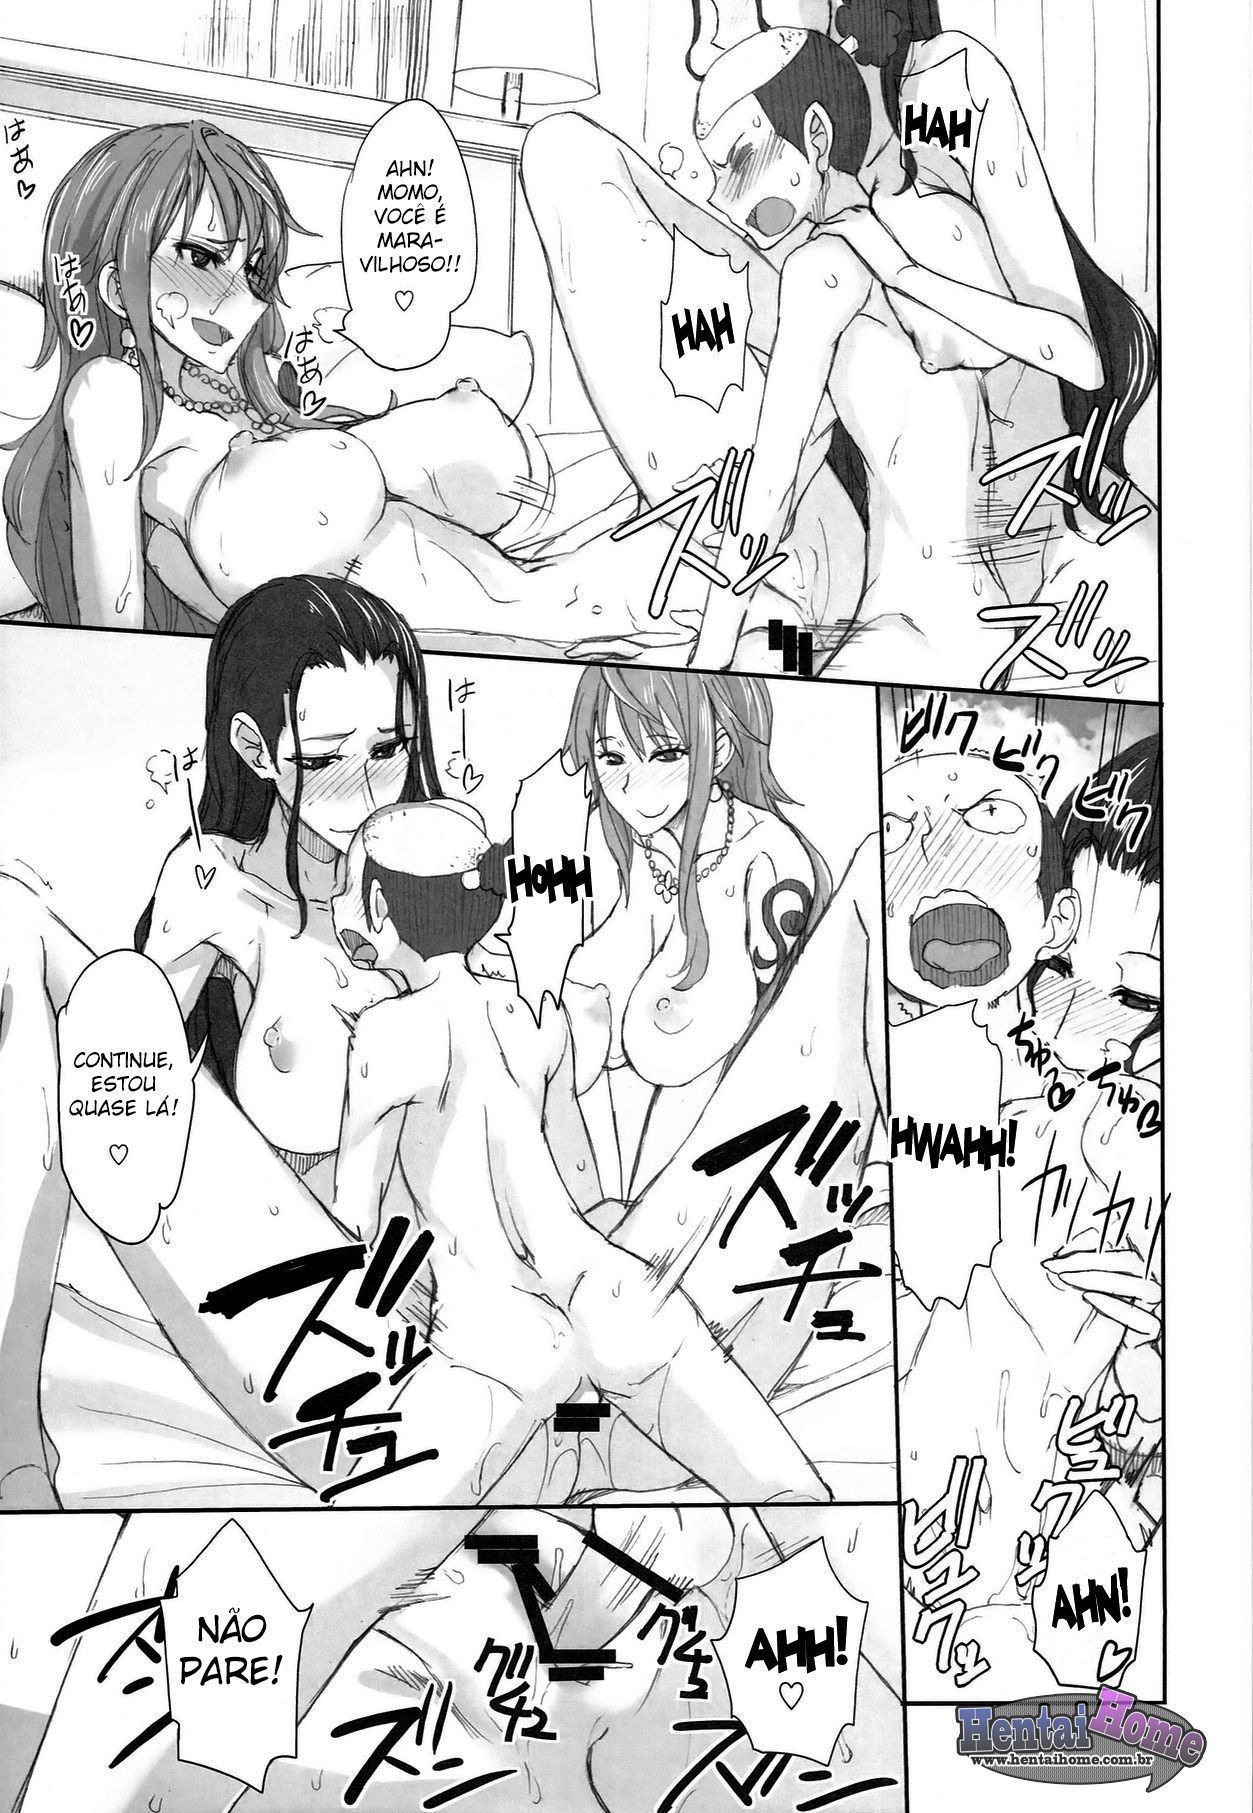 One-Piece-hentai-O-pequeno-samurai-de-Wano-19